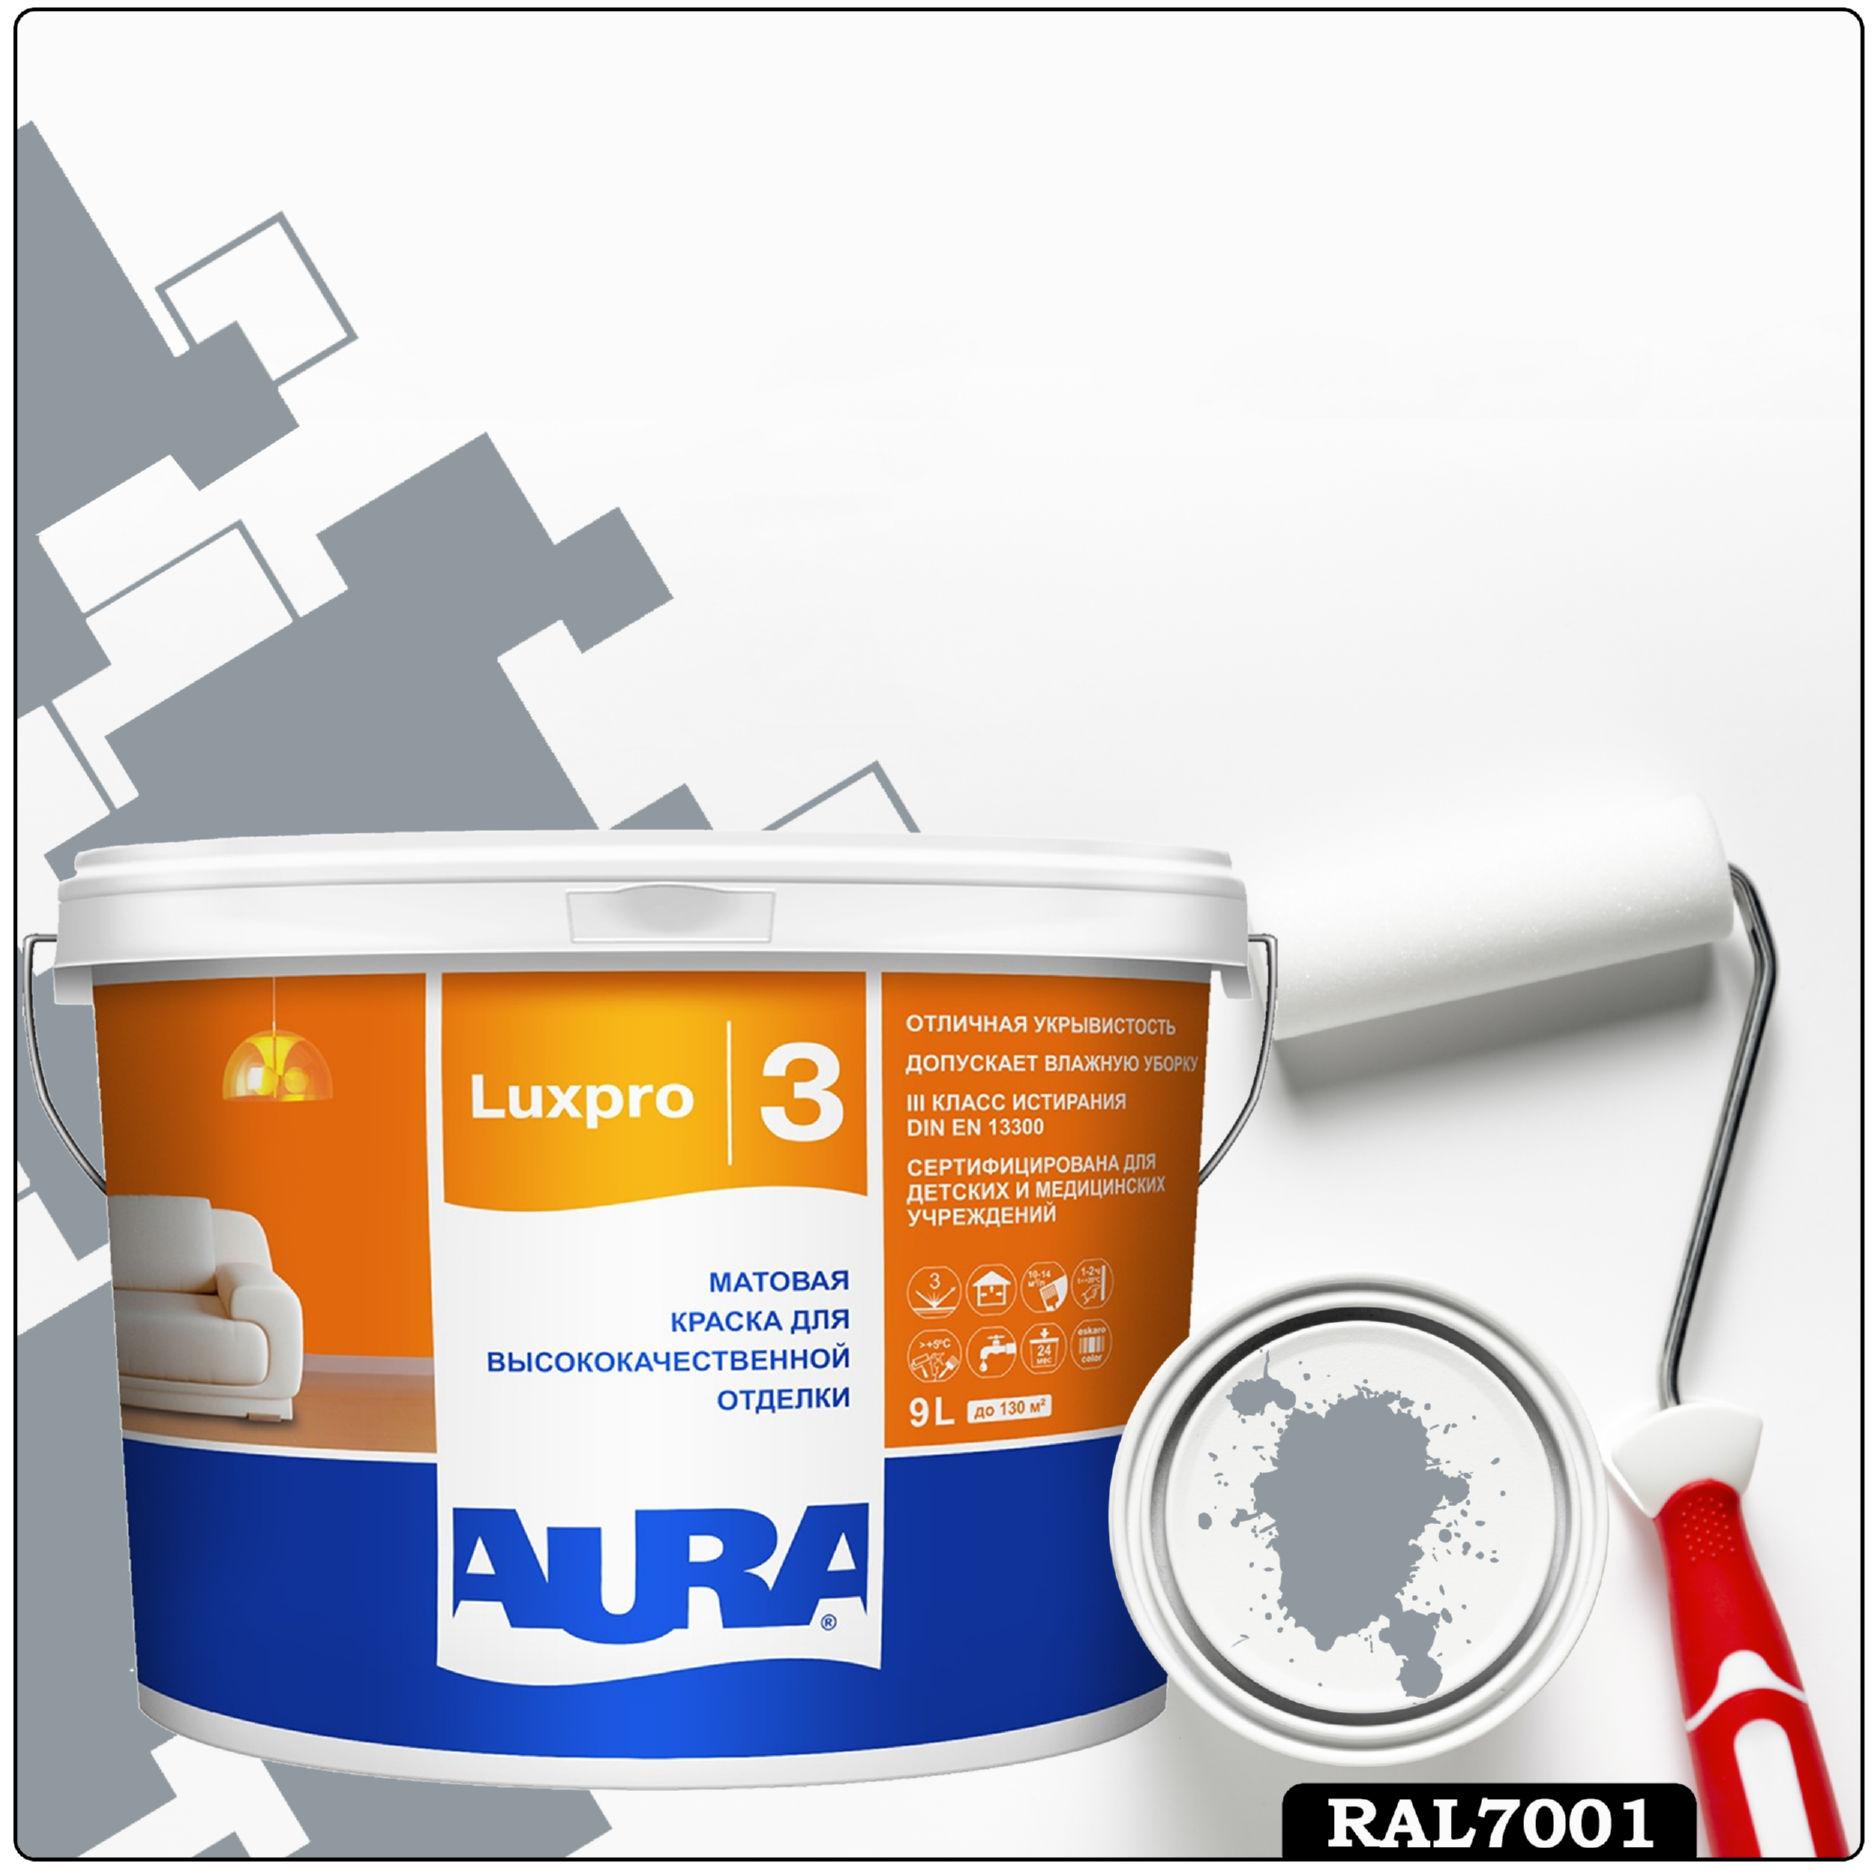 Фото 2 - Краска Aura LuxPRO 3, RAL 7001 Серебристо-серый, латексная, шелково-матовая, интерьерная, 9л, Аура.